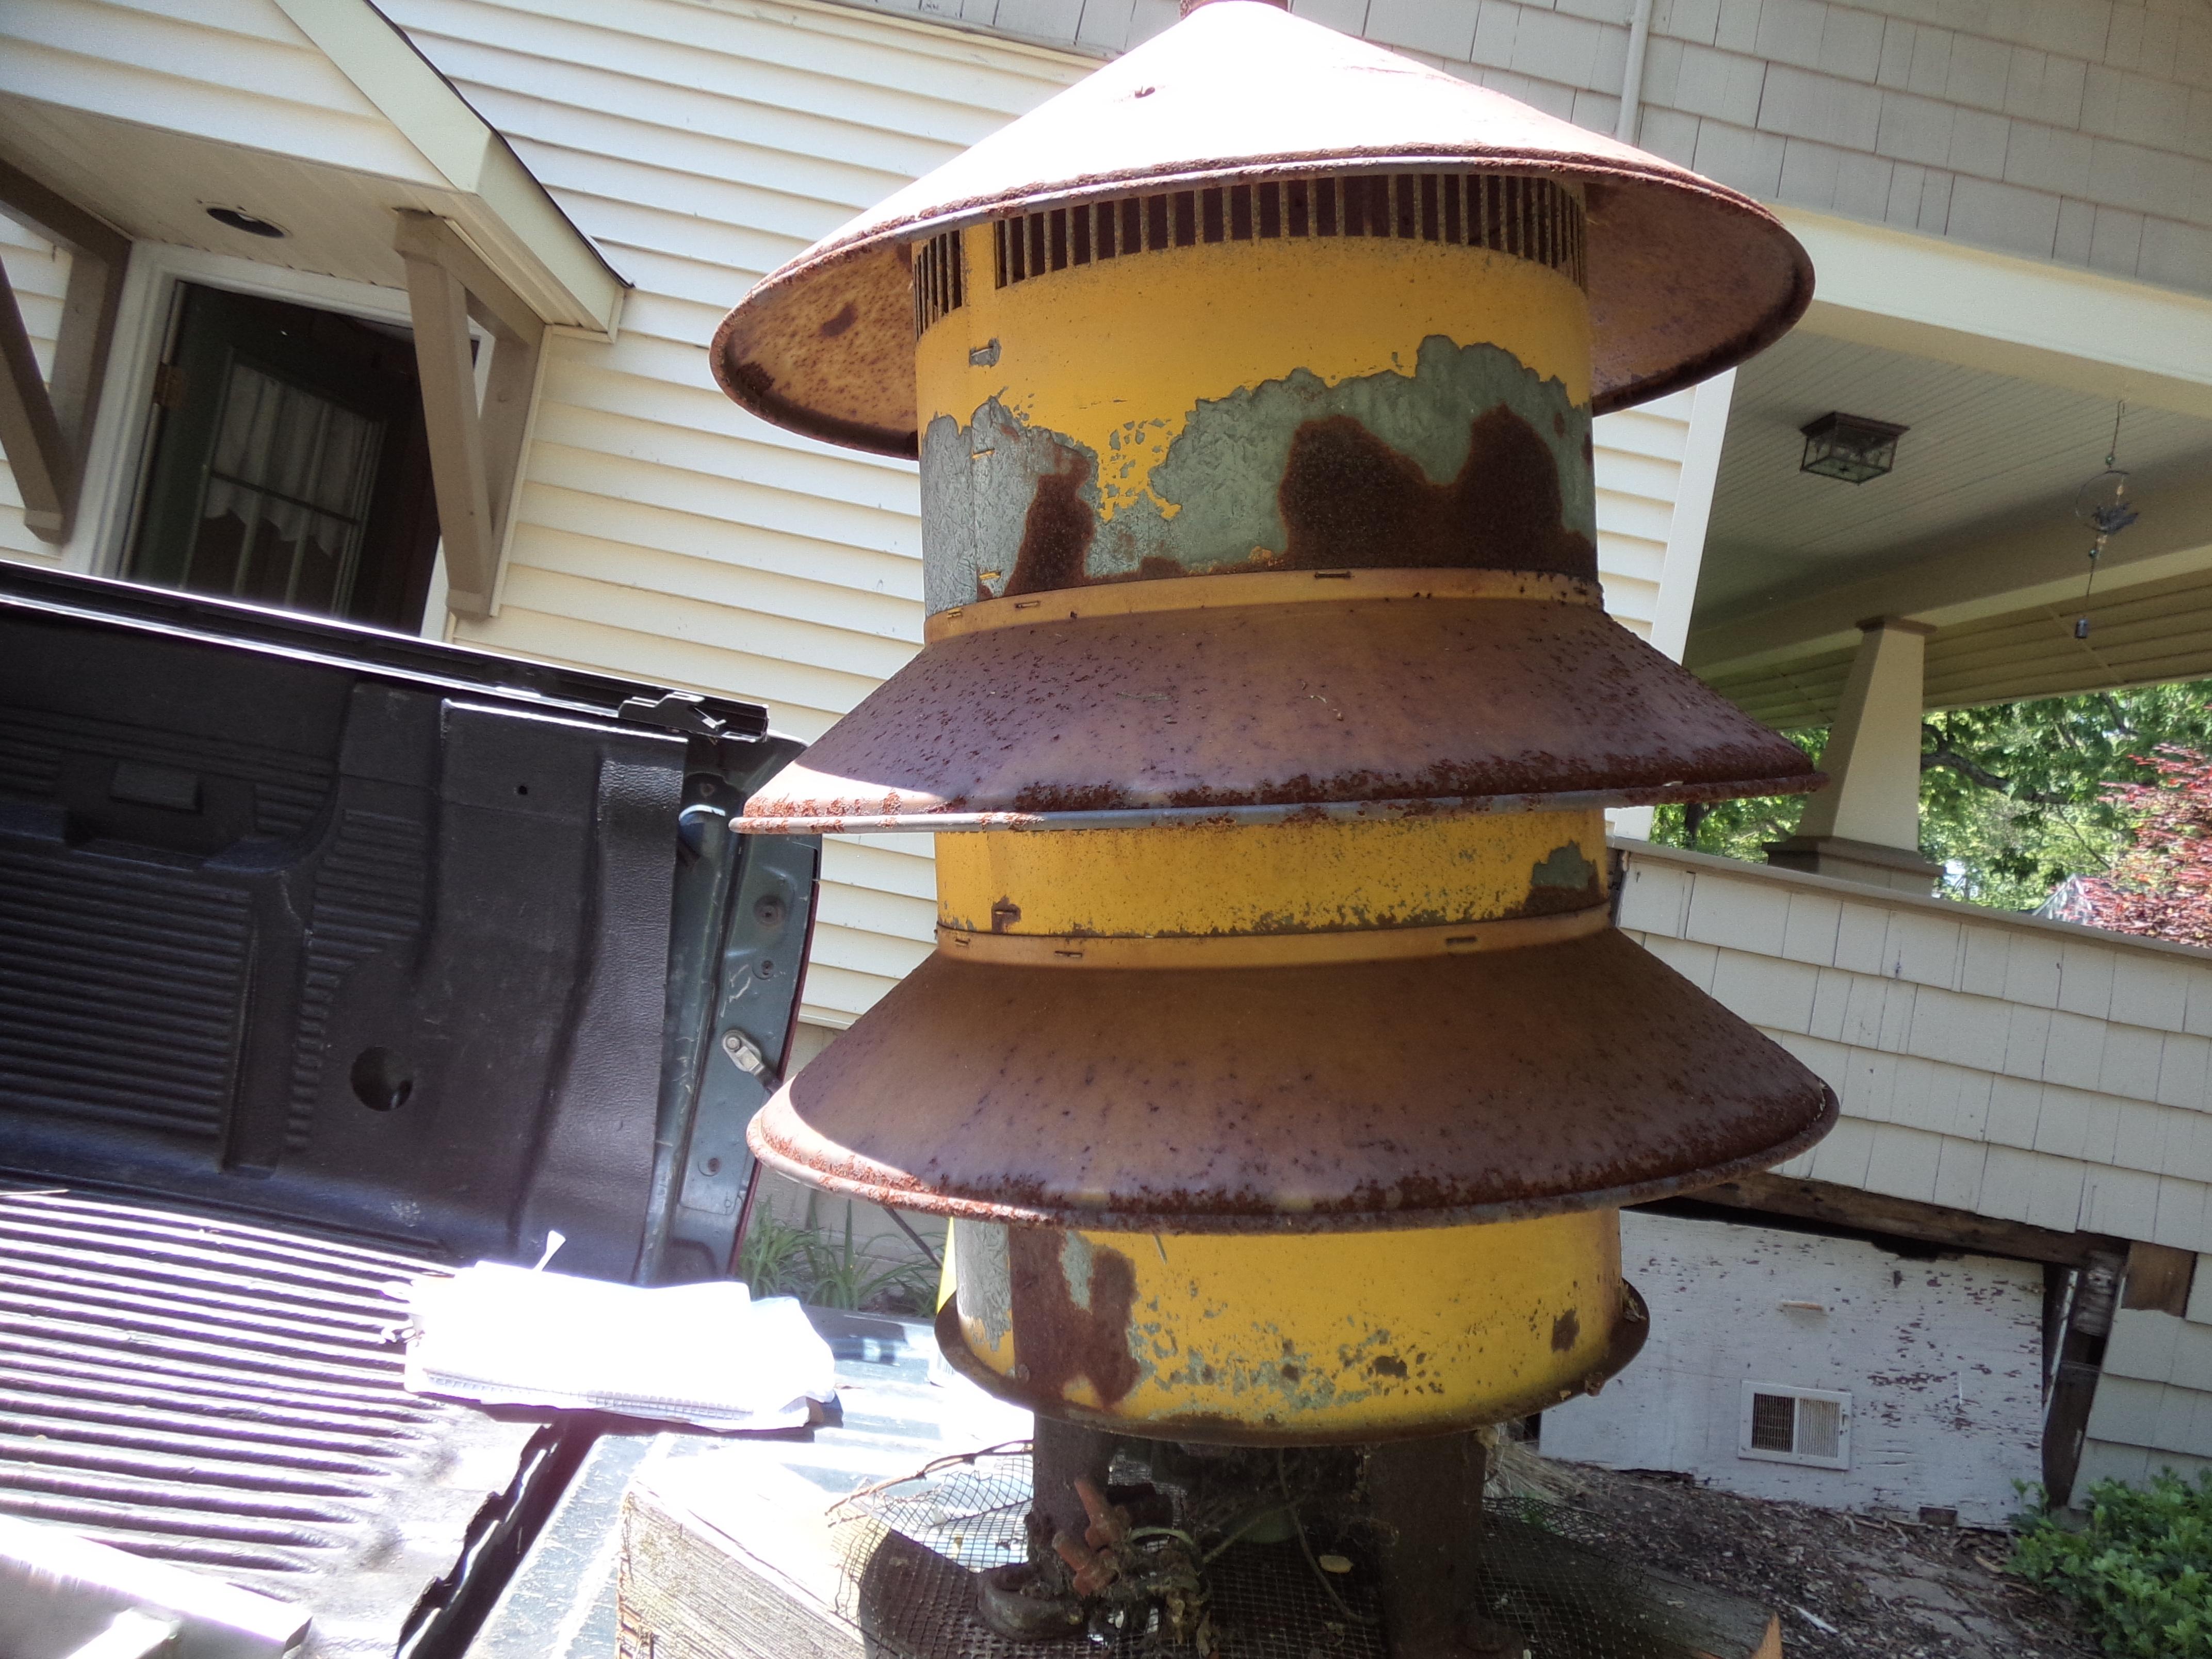 Civil Defense Siren >> Vintage Mid-Century Civil Defense Air Raid Fire Siren « Obnoxious Antiques